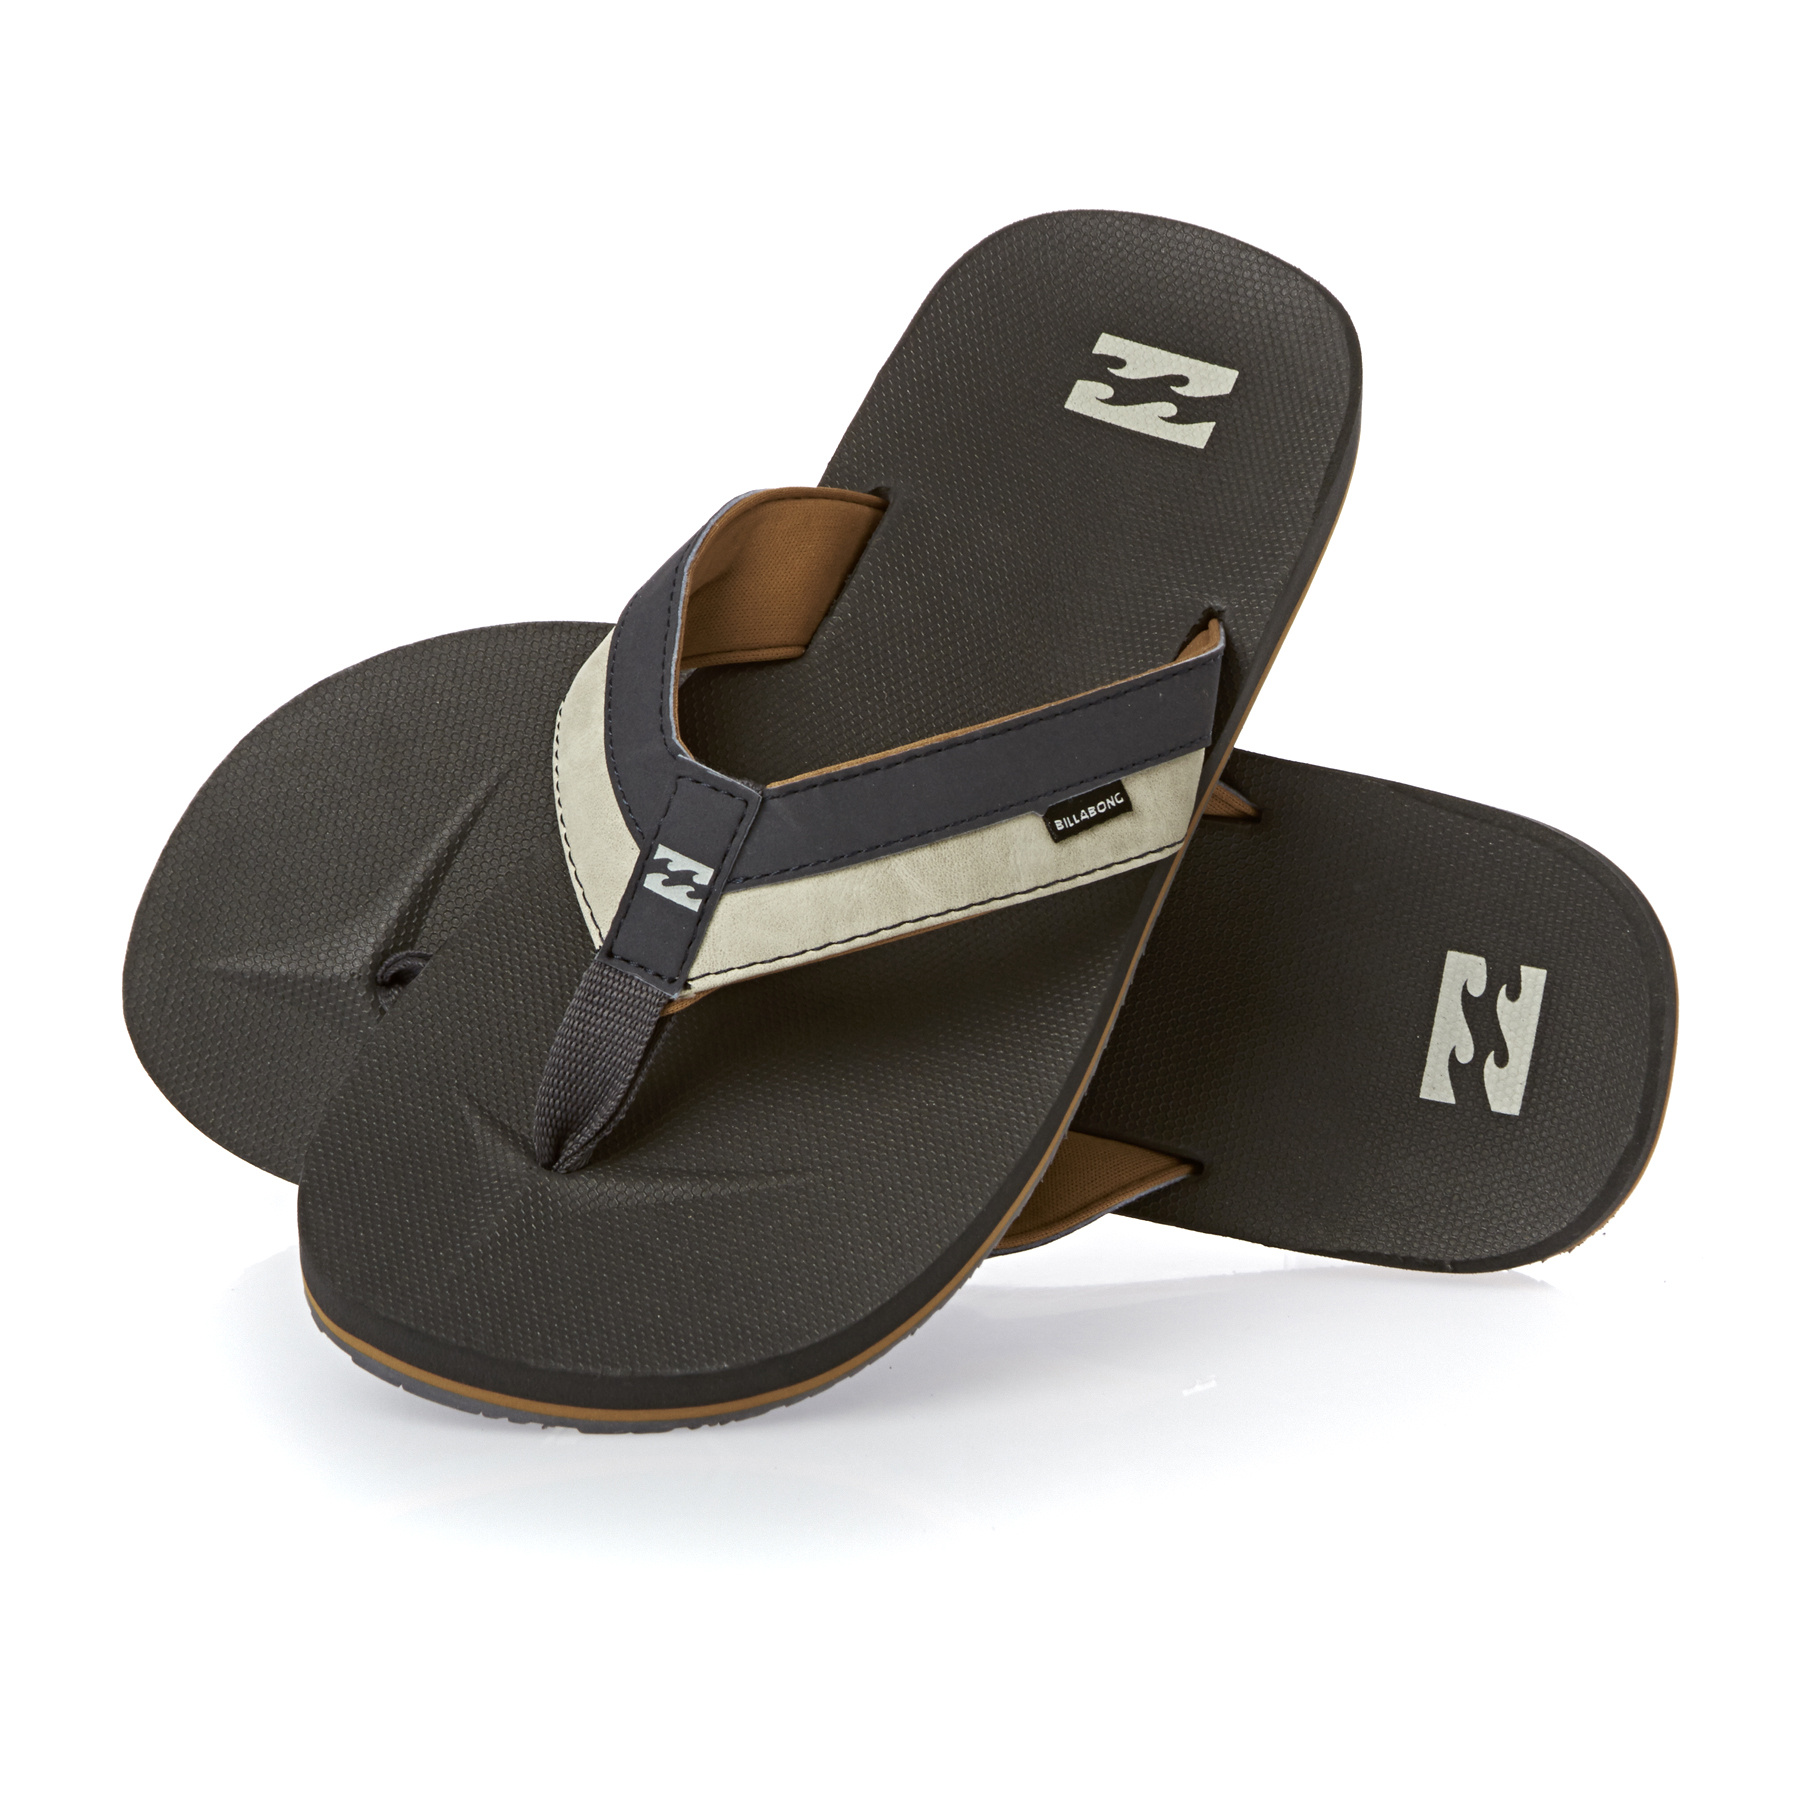 Billabong All Day Impact Sandal New Charcoal